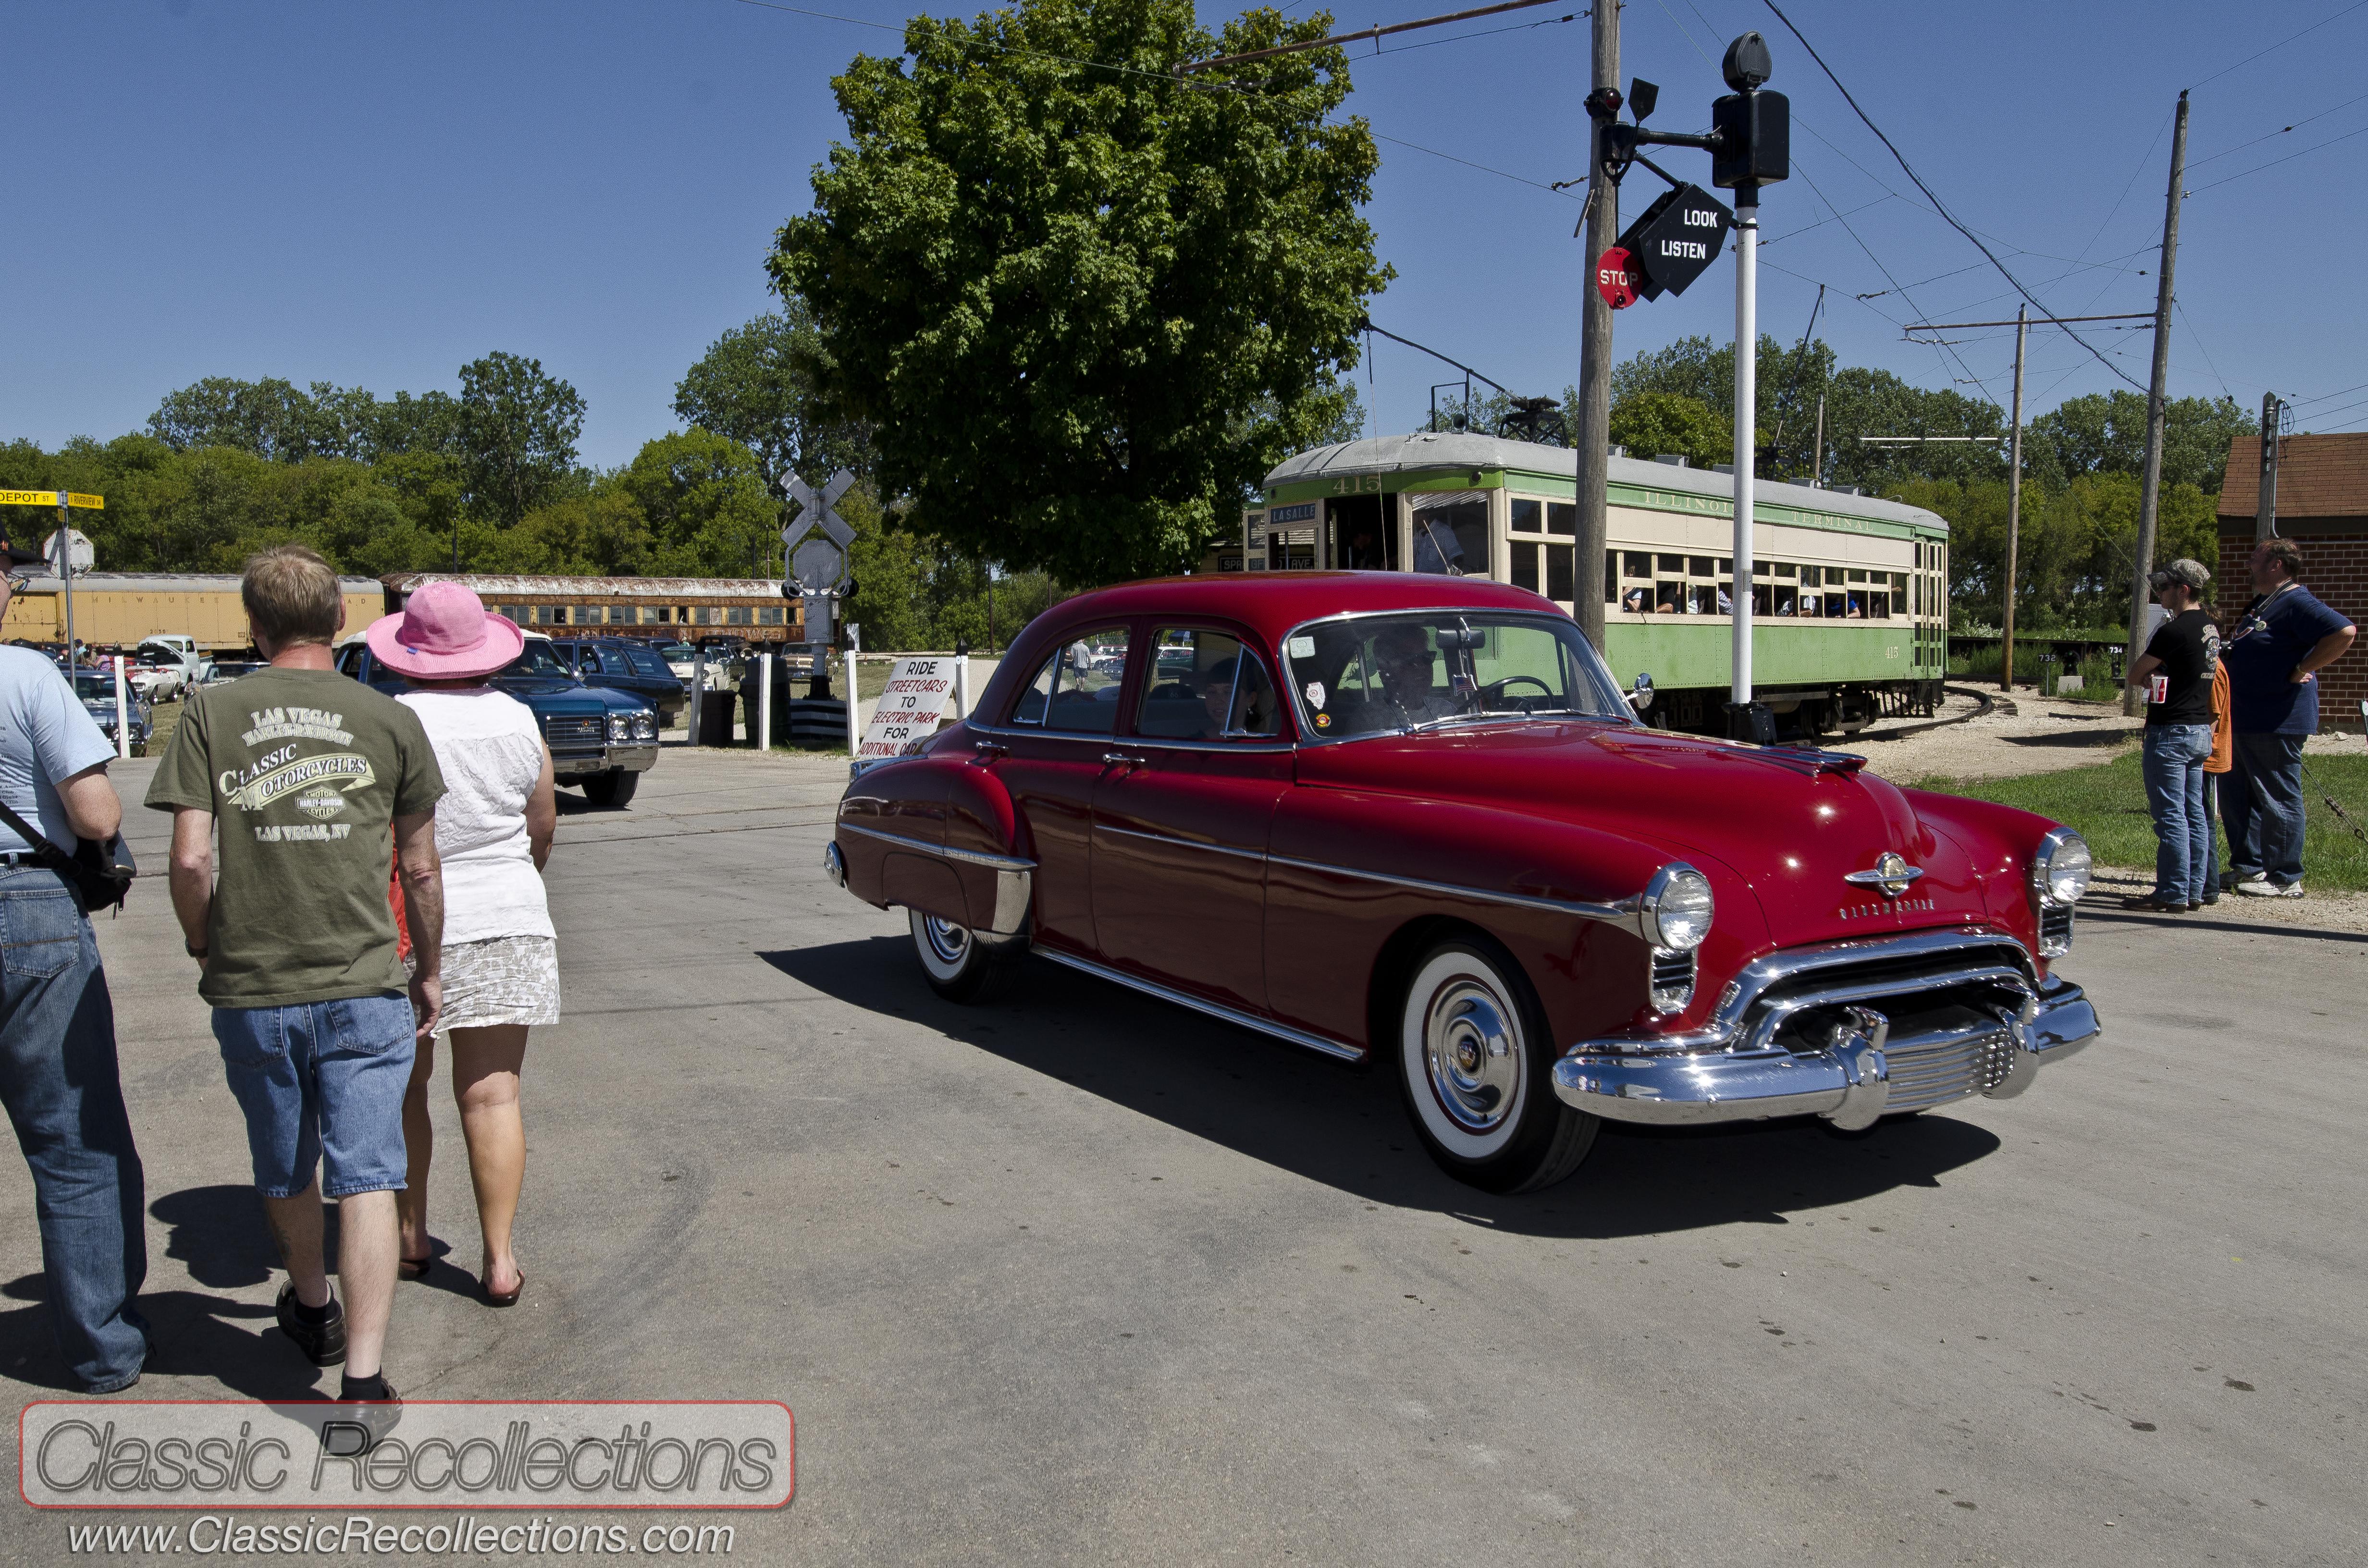 SHOWS: Vintage Transport Extravaganza 2012, Union, Illinois ...